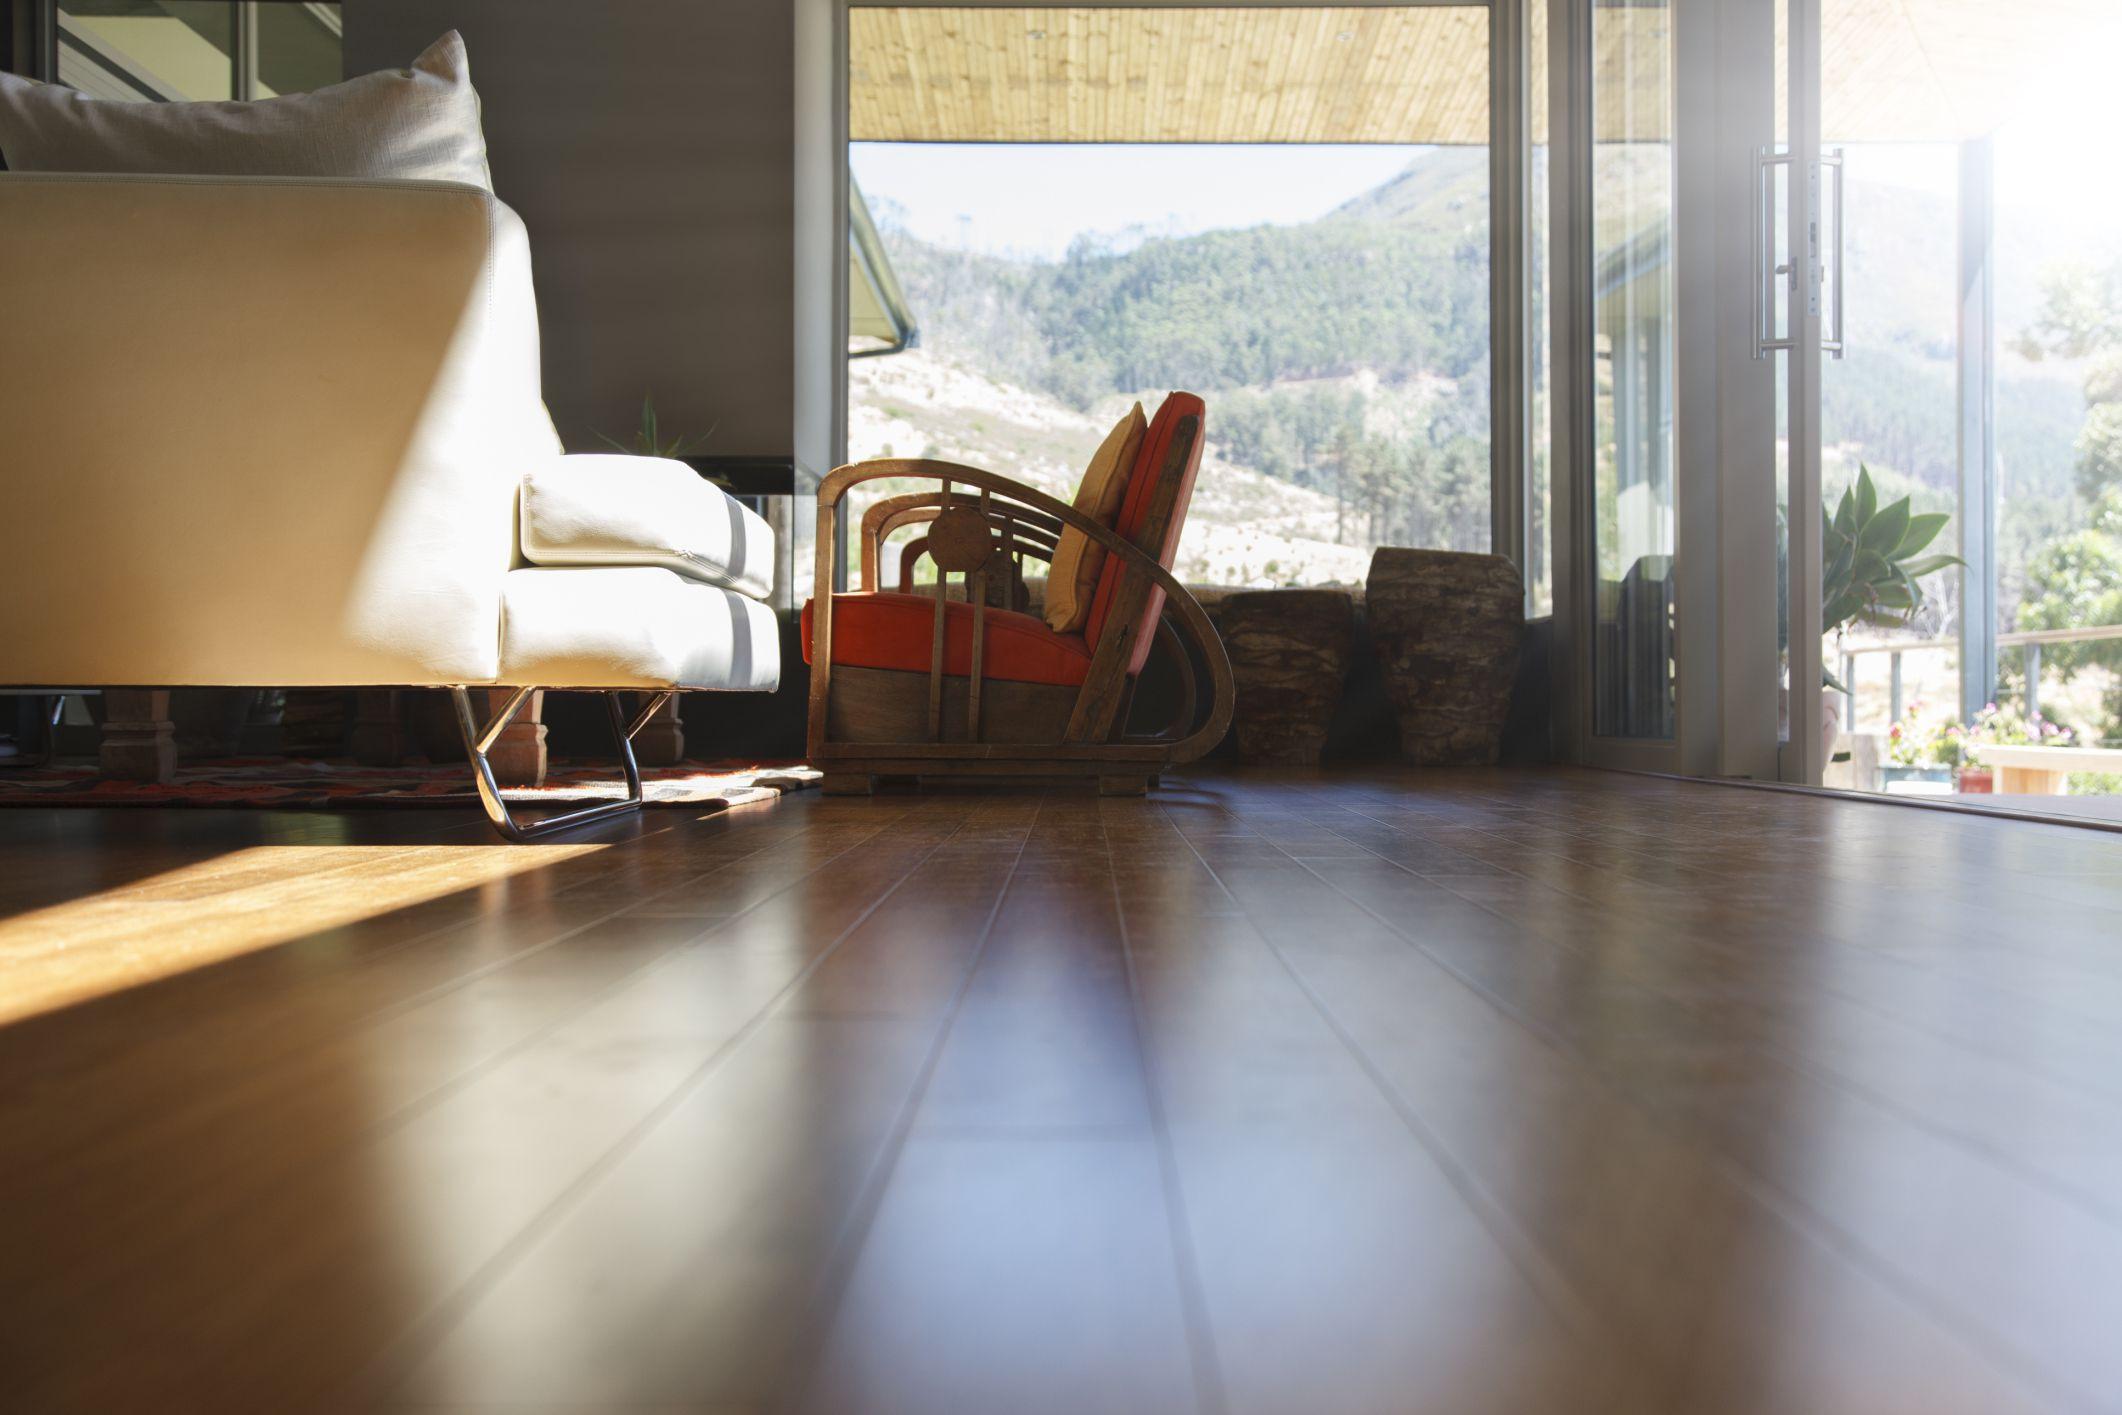 hardwood floor refinishing waukesha of pros and cons of bellawood flooring from lumber liquidators for exotic hardwood flooring 525439899 56a49d3a3df78cf77283453d